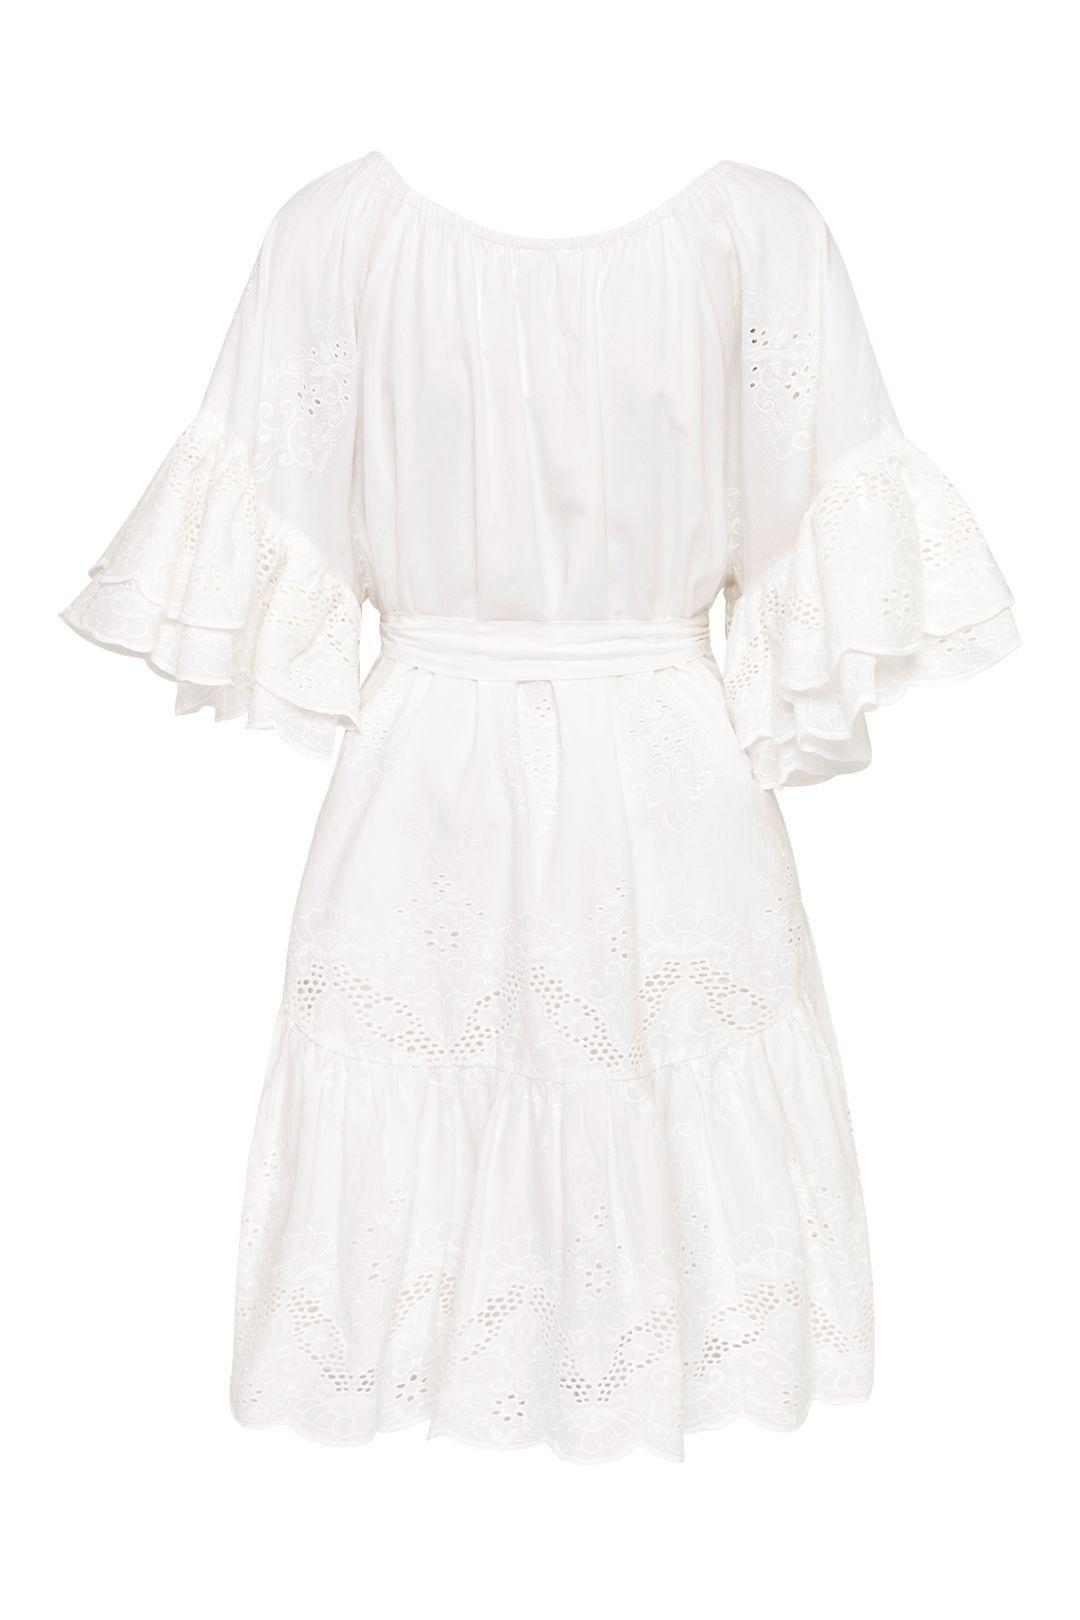 Spell Capulet Broderie Anglaise Frill Smock Dress White Ruffle